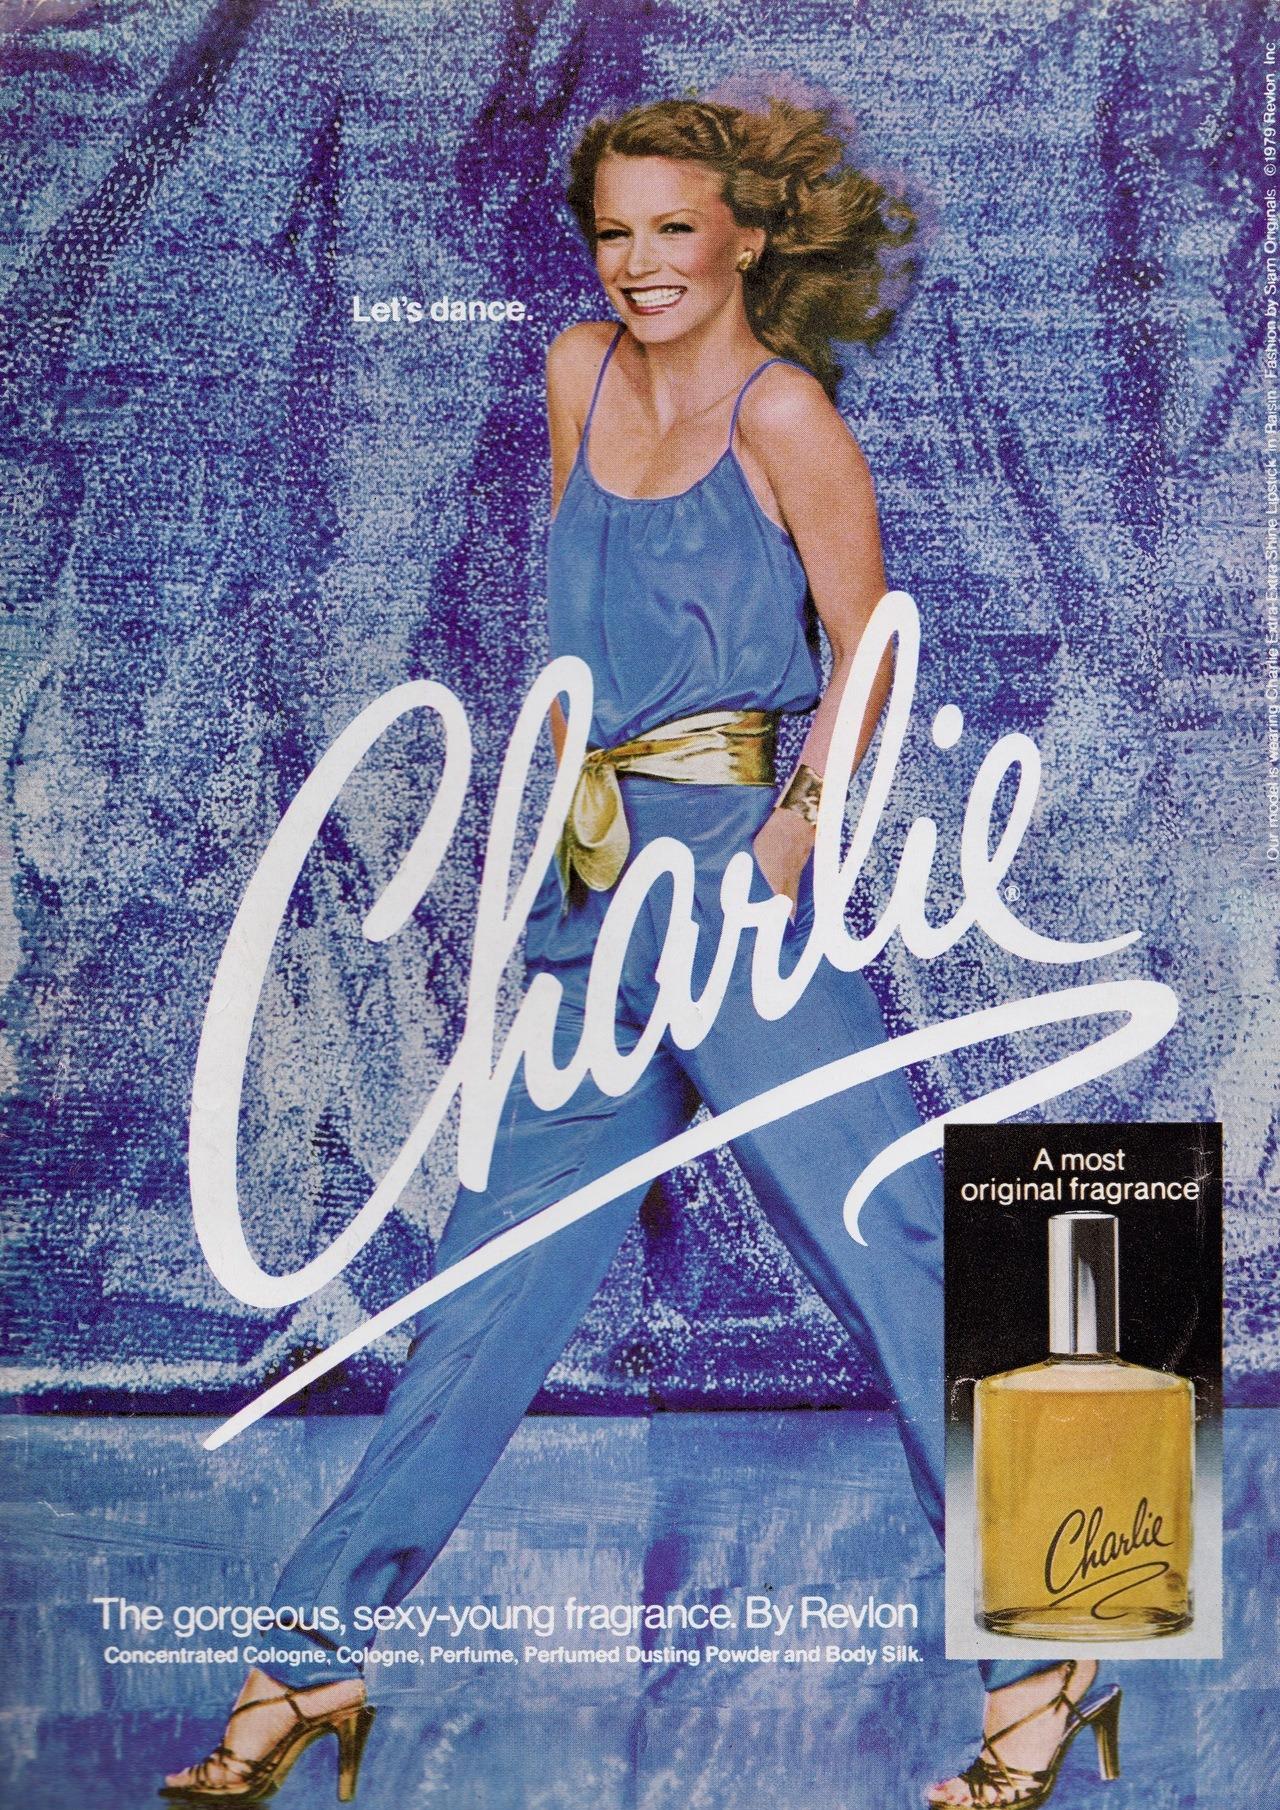 Charlie perfume | Etsy